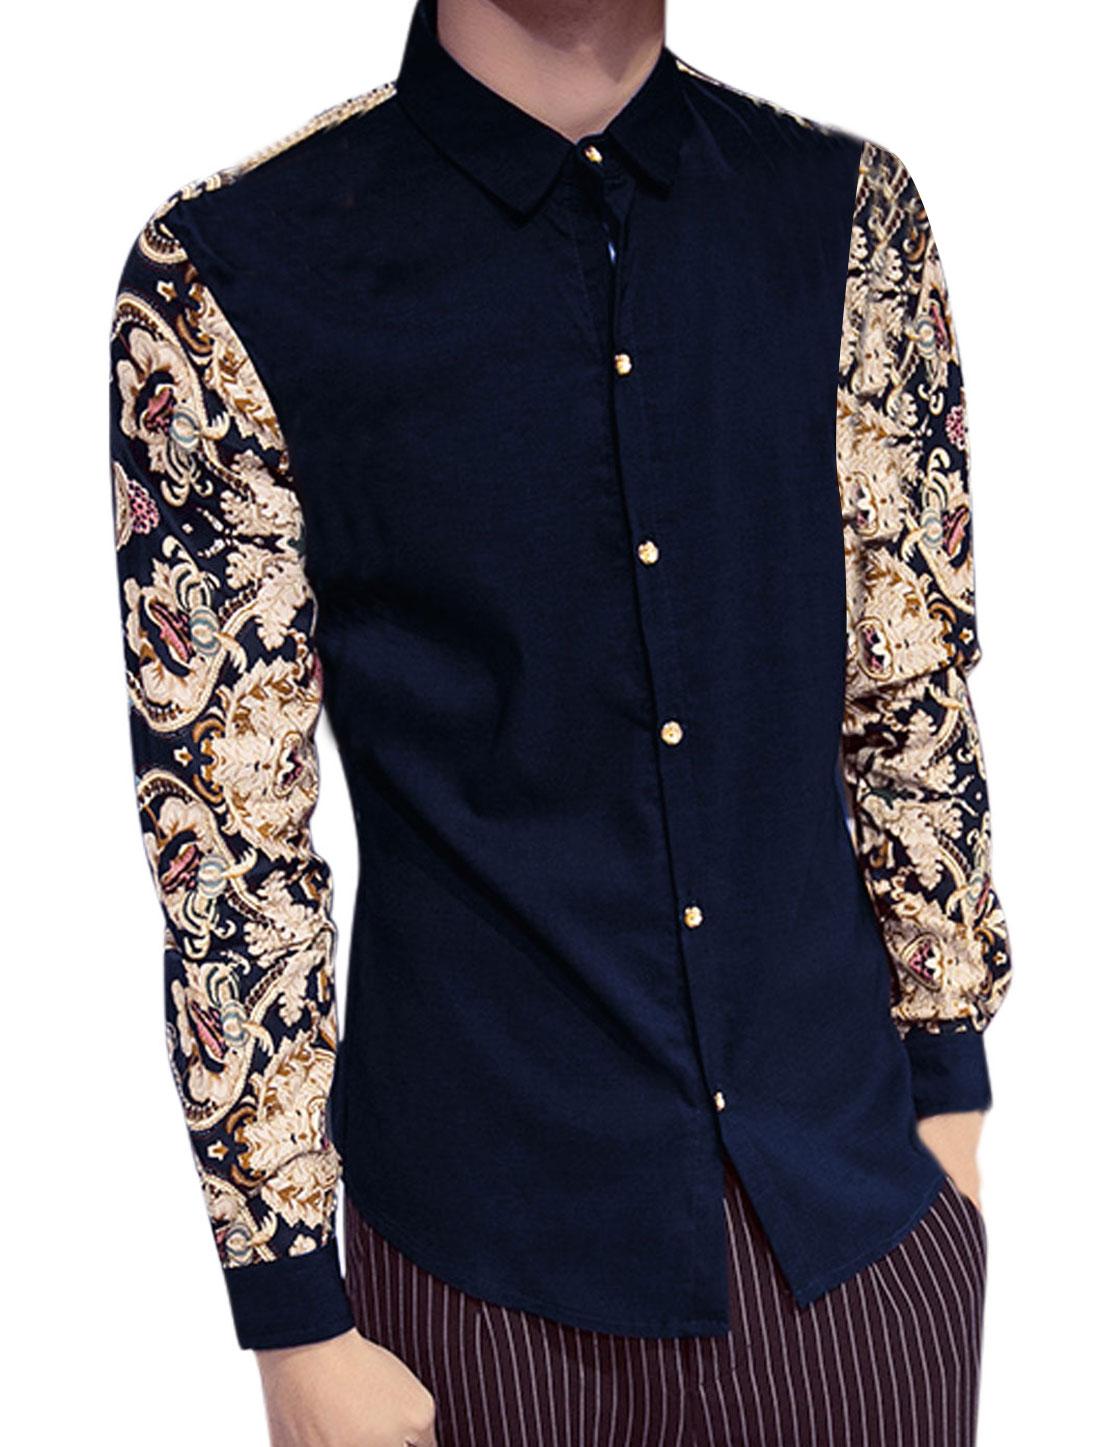 Men Slim Fit Novelty Pattern Casual Shirt Navy Blue S